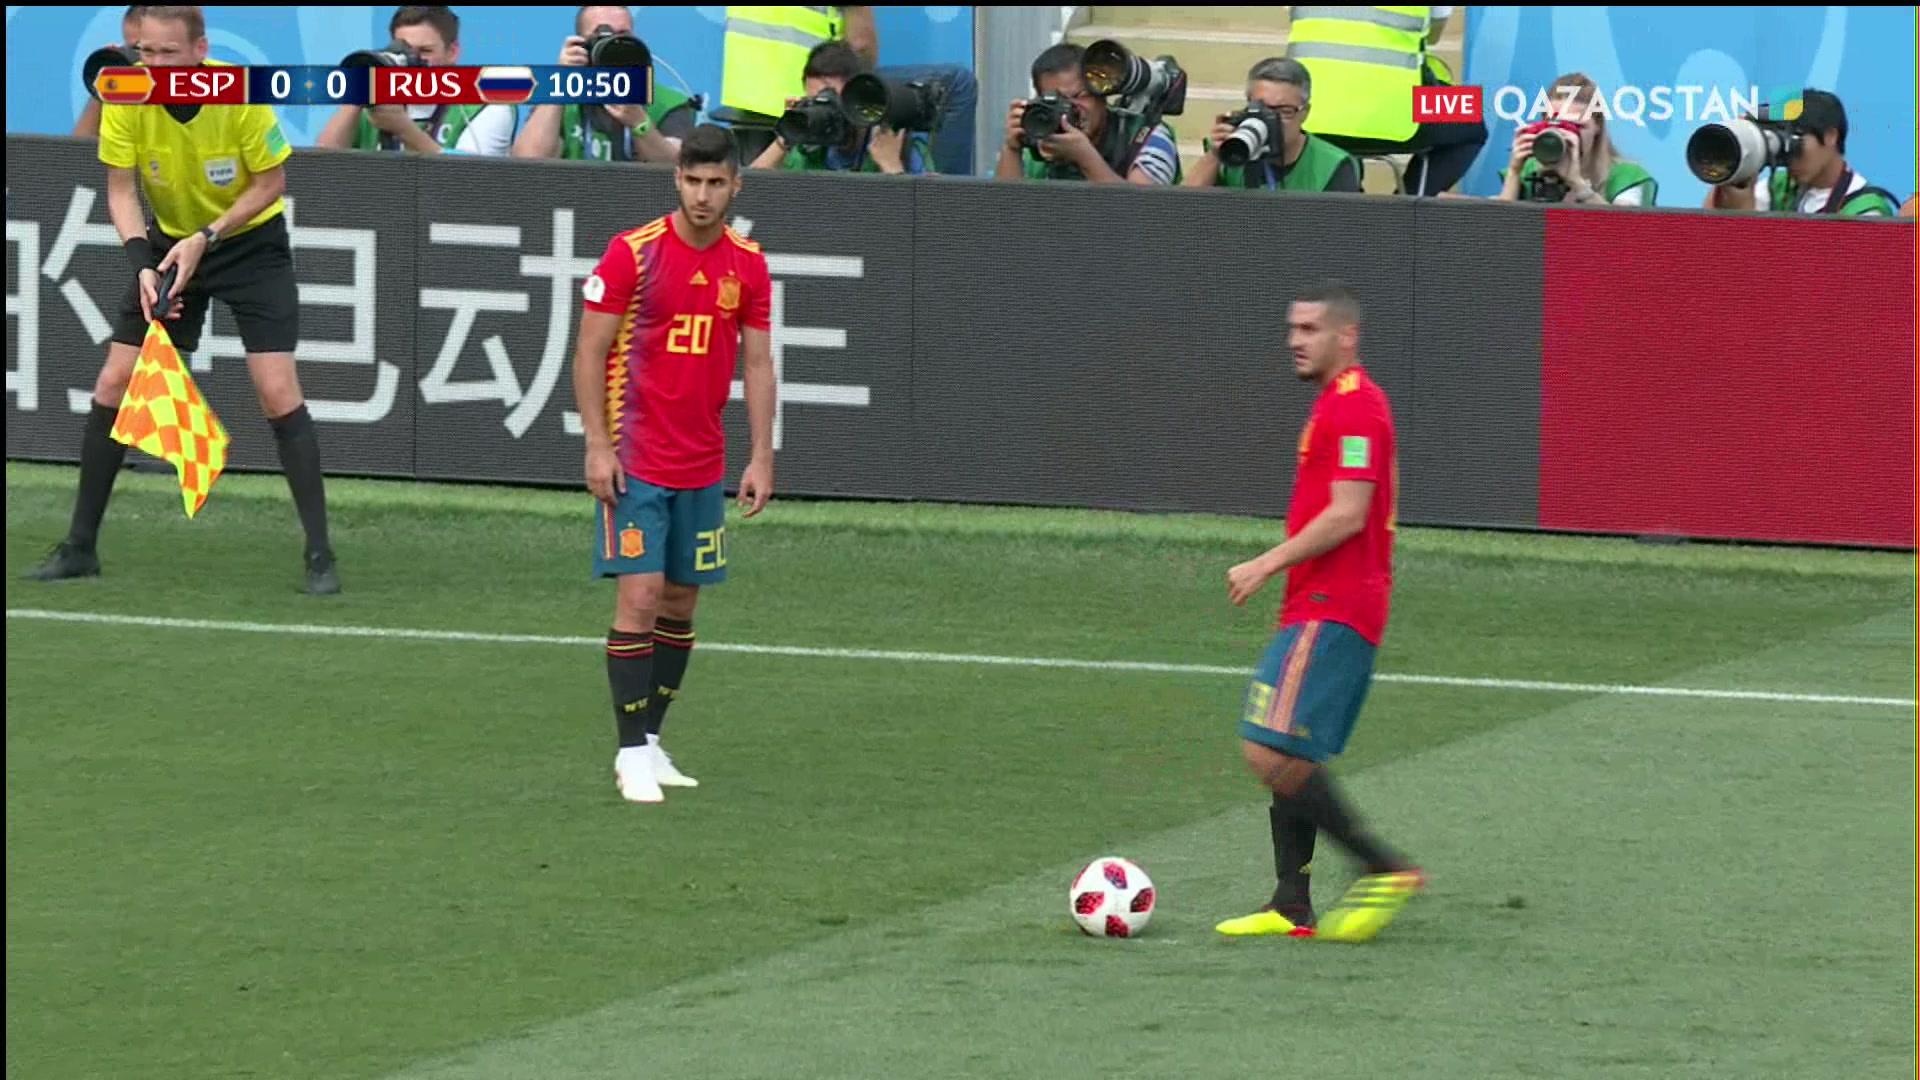 Испания – Ресей – 1:0 | Әлем Чемпионаты 2018: Игнашевич өз қақпасына гол соғып алды